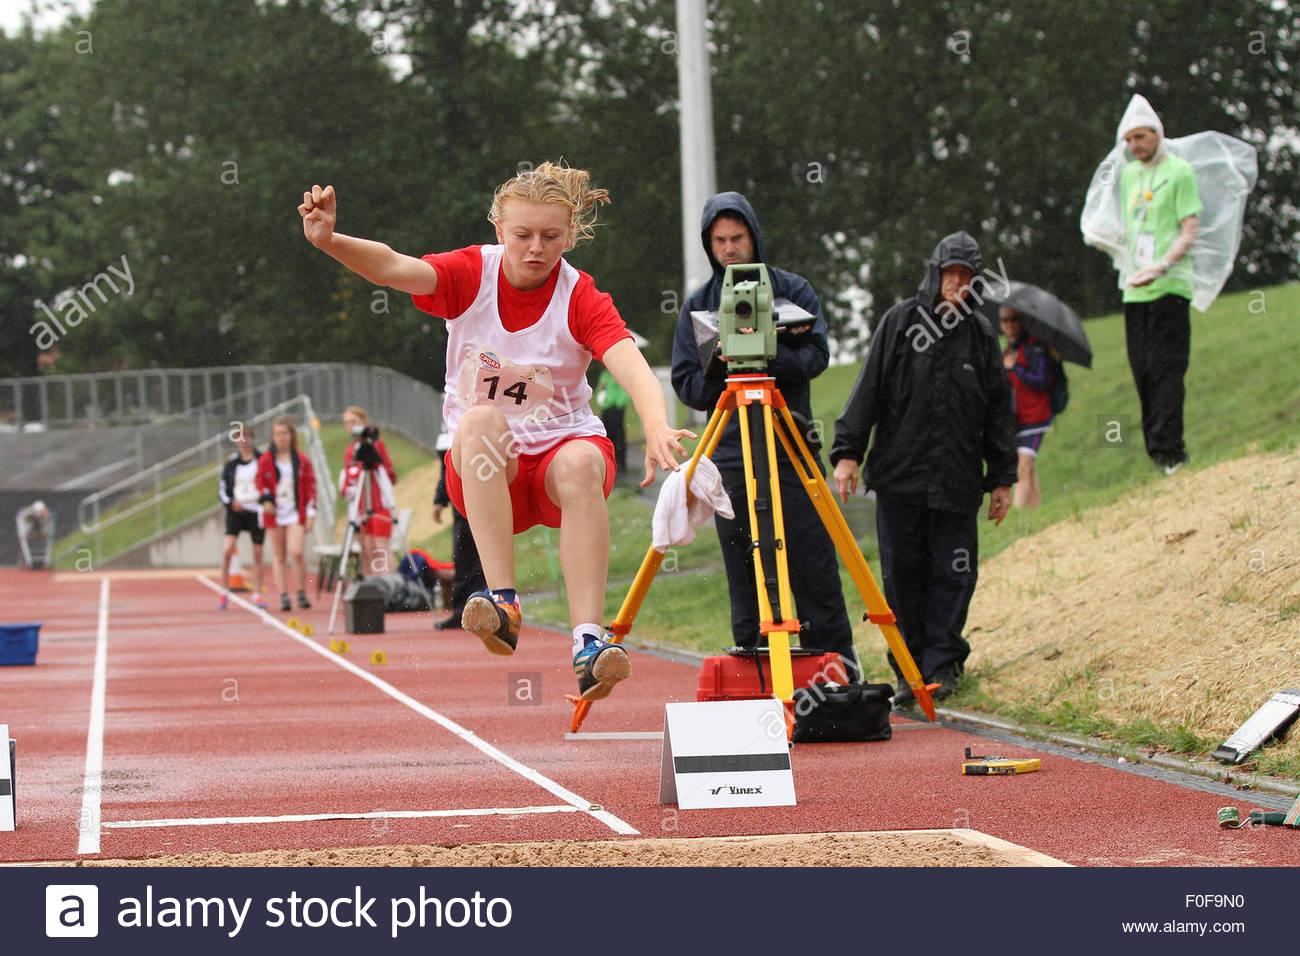 nottingham-uk-14th-aug-2015-2015-cerebral-palsy-world-games-track-F0F9N0